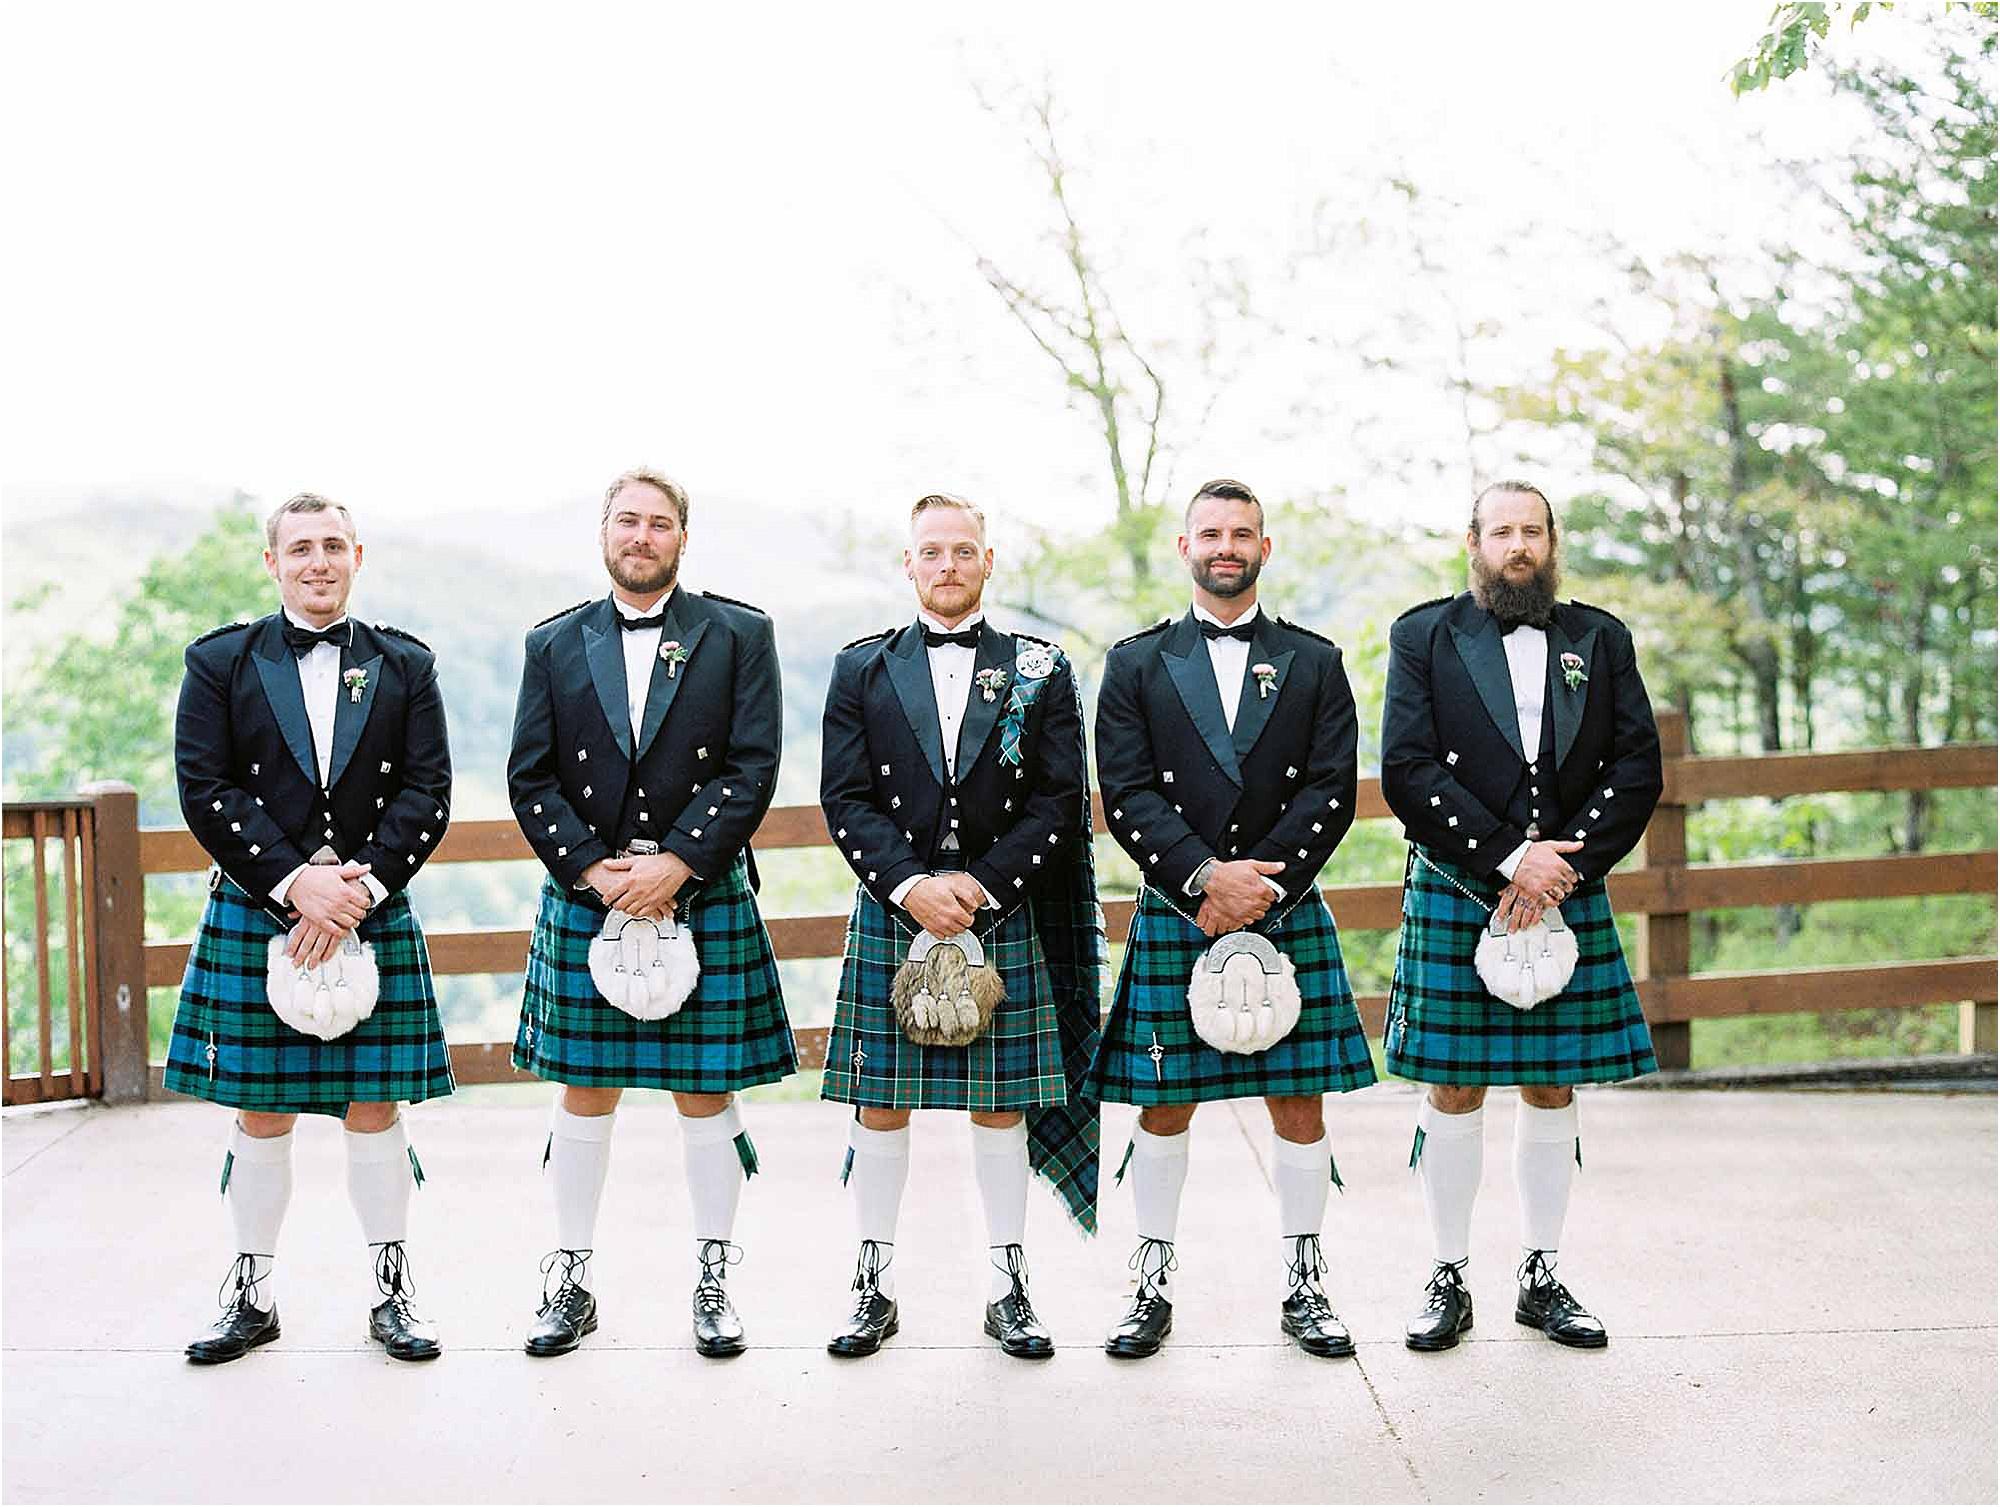 groom and groomsmen in kilts at Scottish Wedding